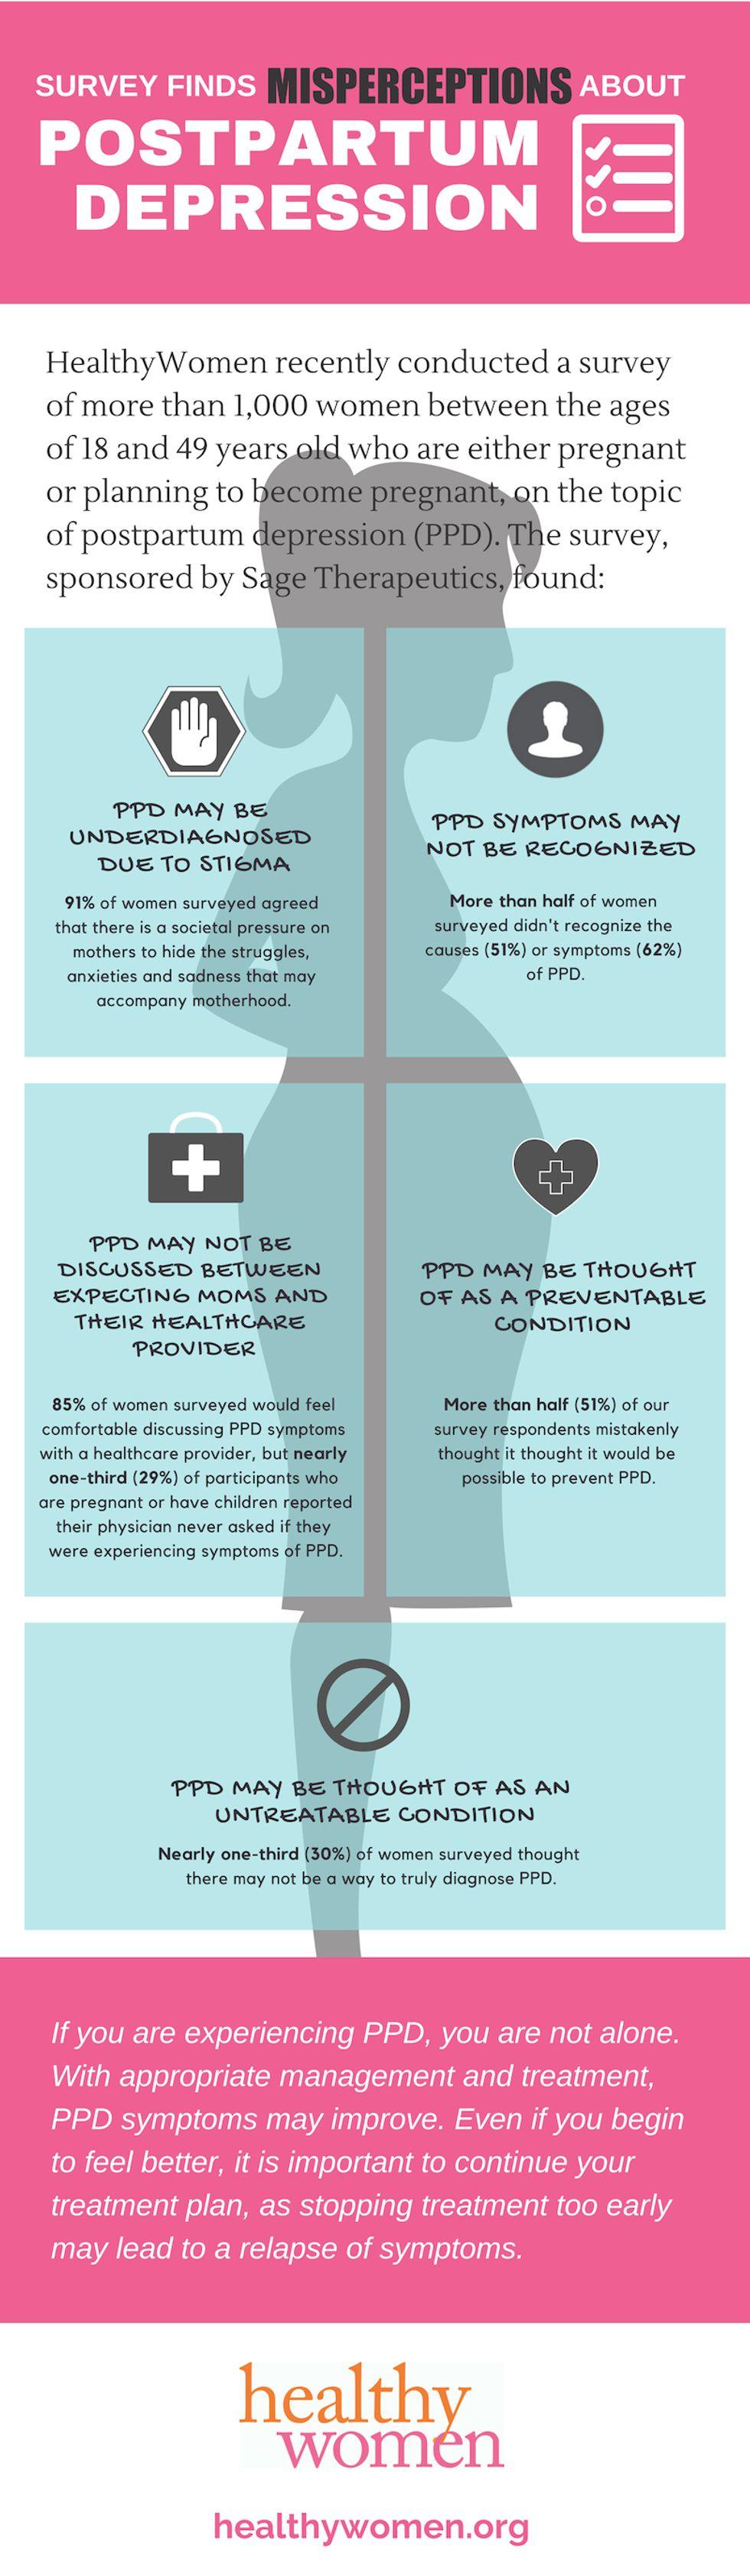 Why Aren't Women Speaking Up About Postpartum Depression?